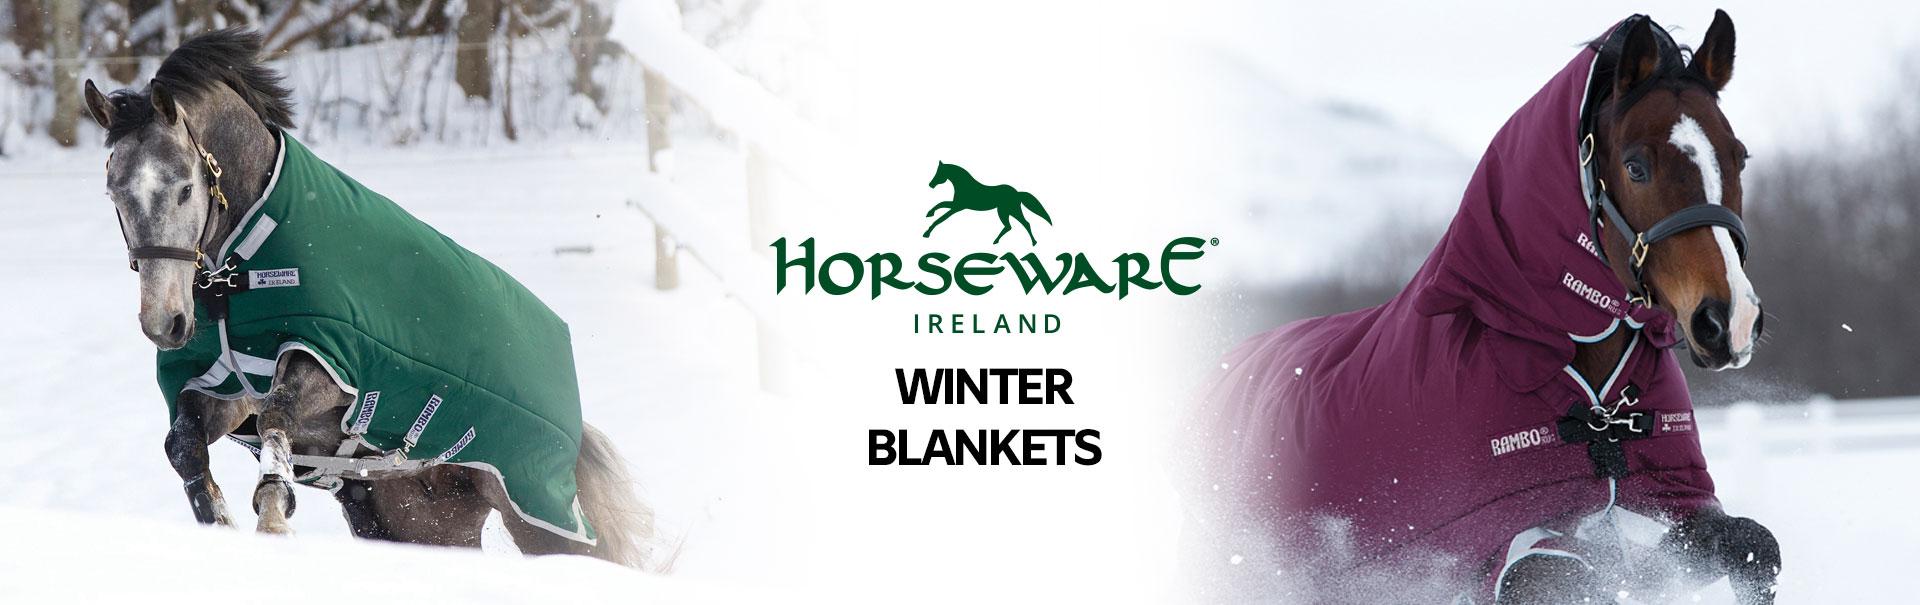 Horseware Ireland Winter Blankets